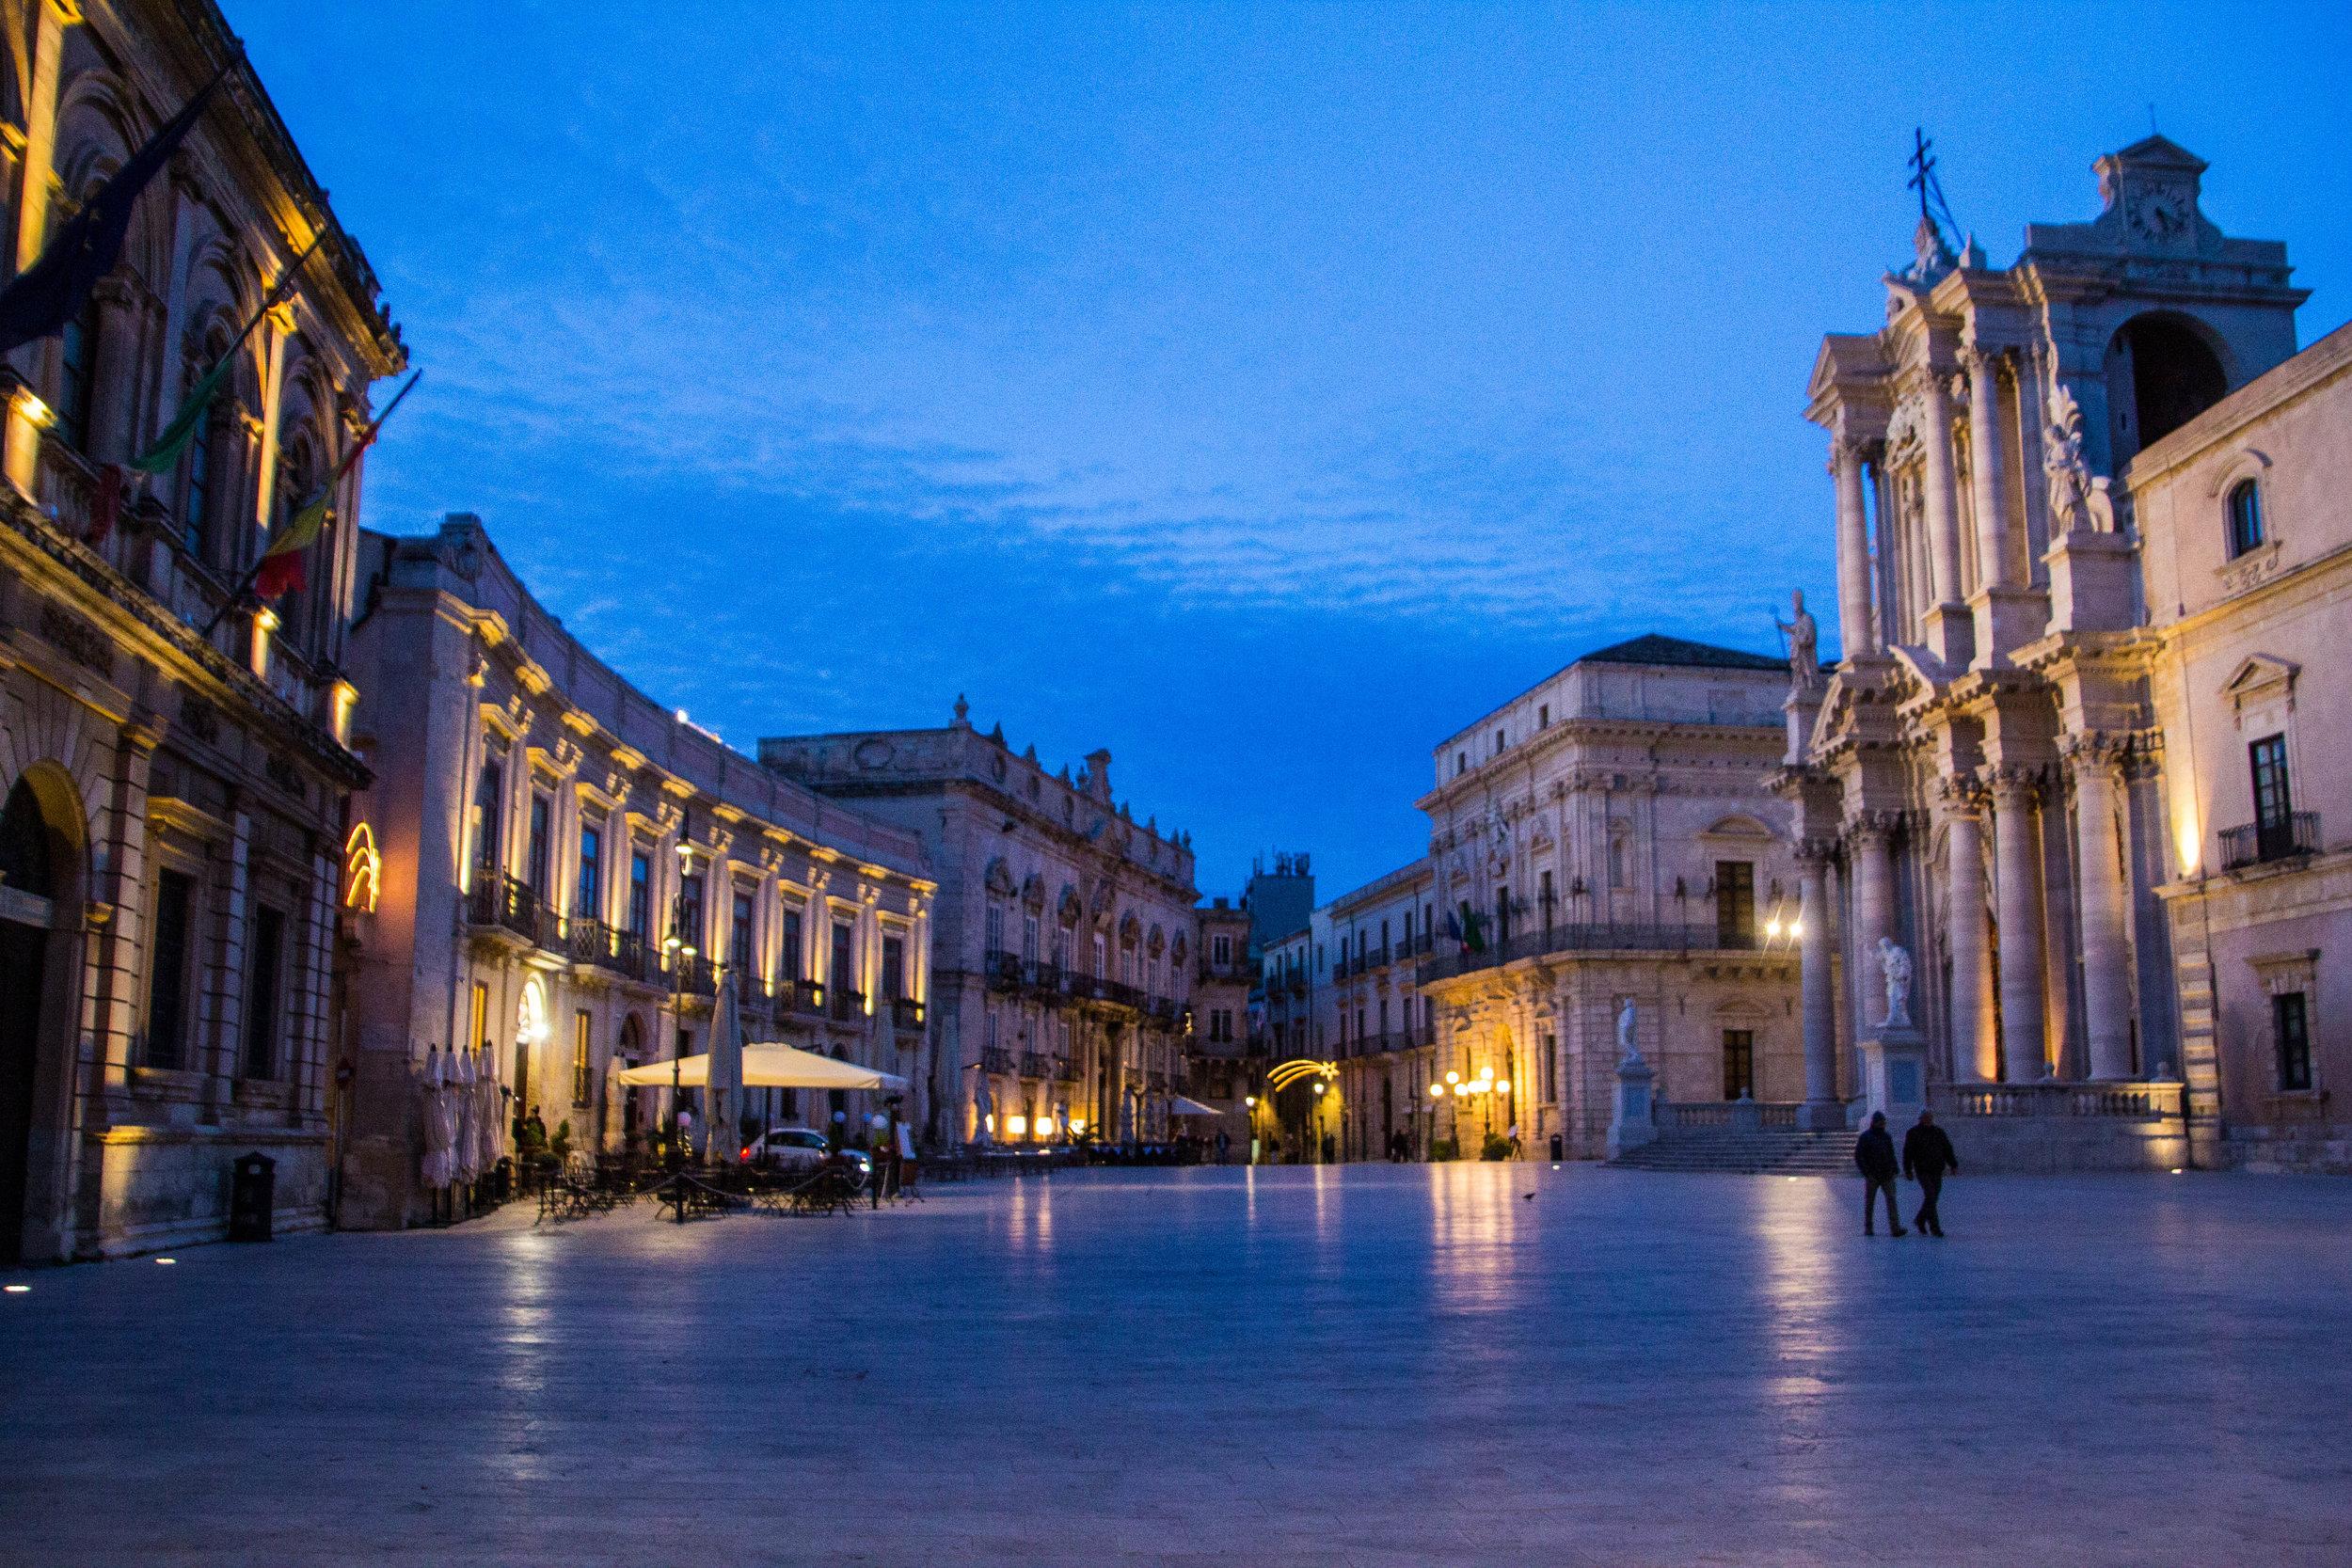 piazza-duomo-sunset-ortygia-syracuse-sicily-28.jpg